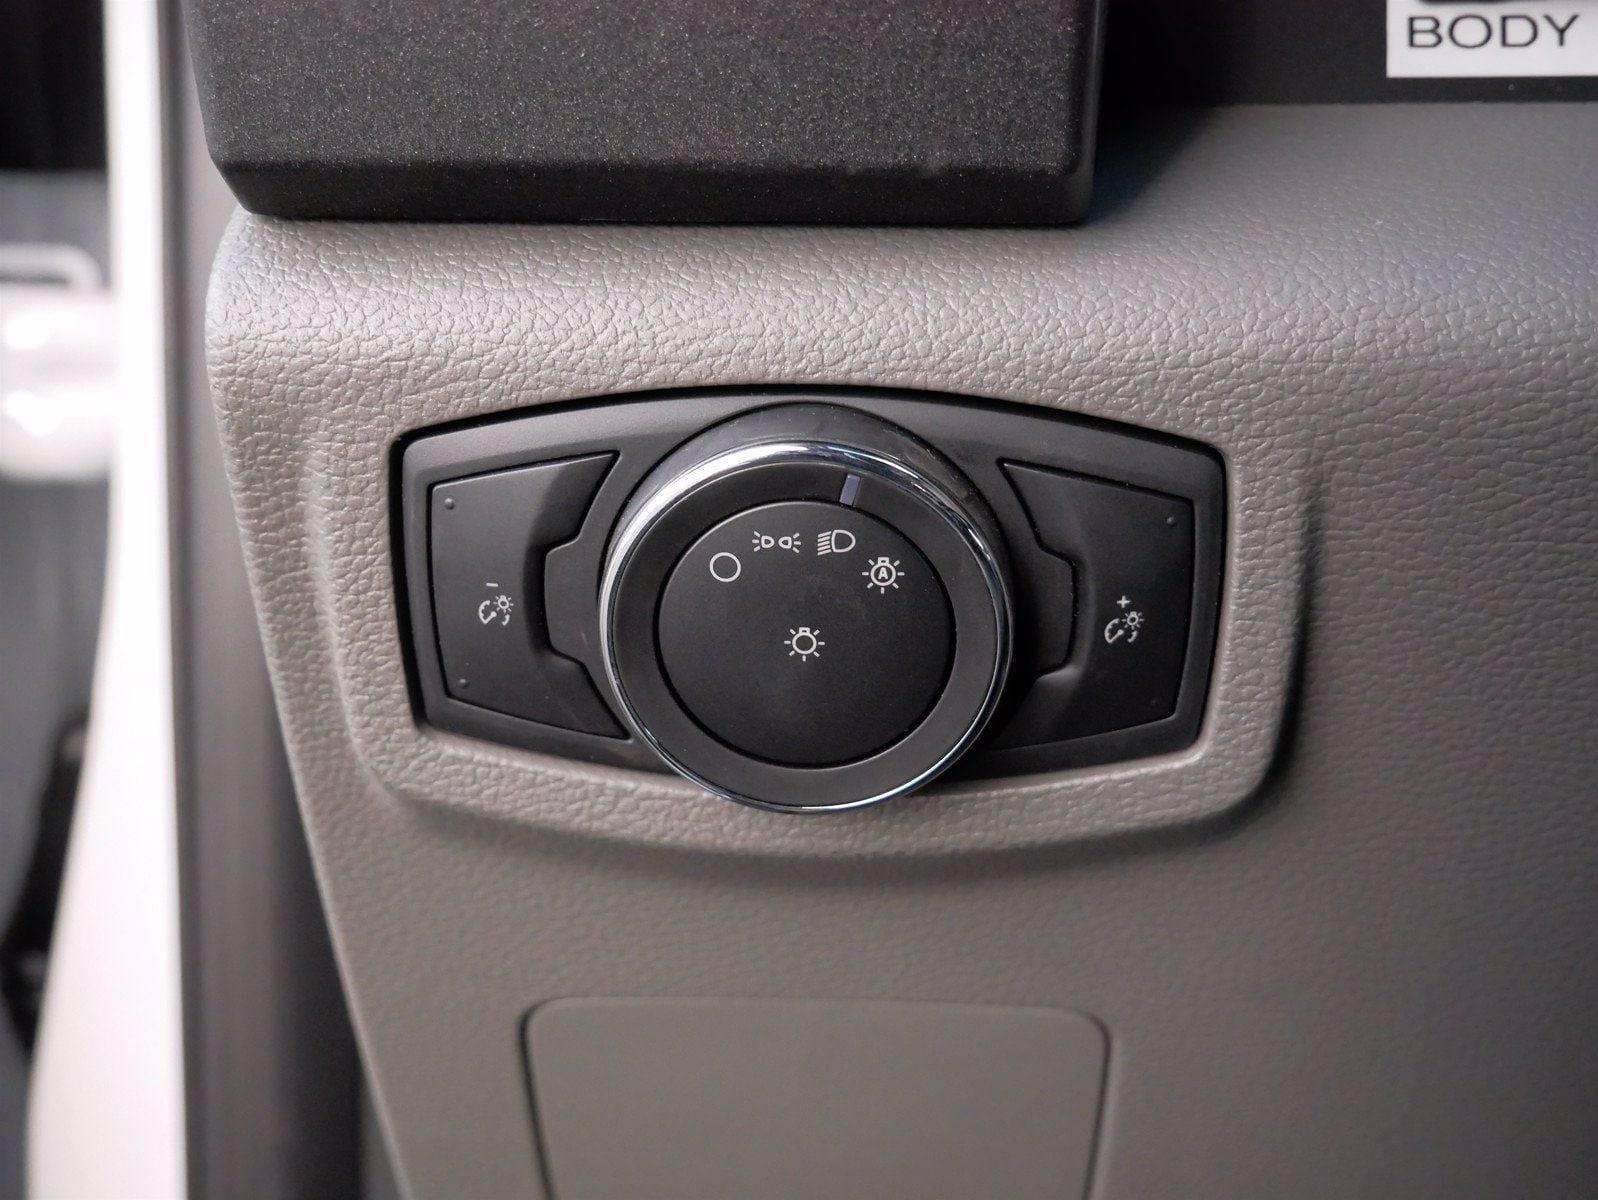 2021 Ford F-550 Regular Cab DRW 4x4, Scelzi Dump Body #64096 - photo 15